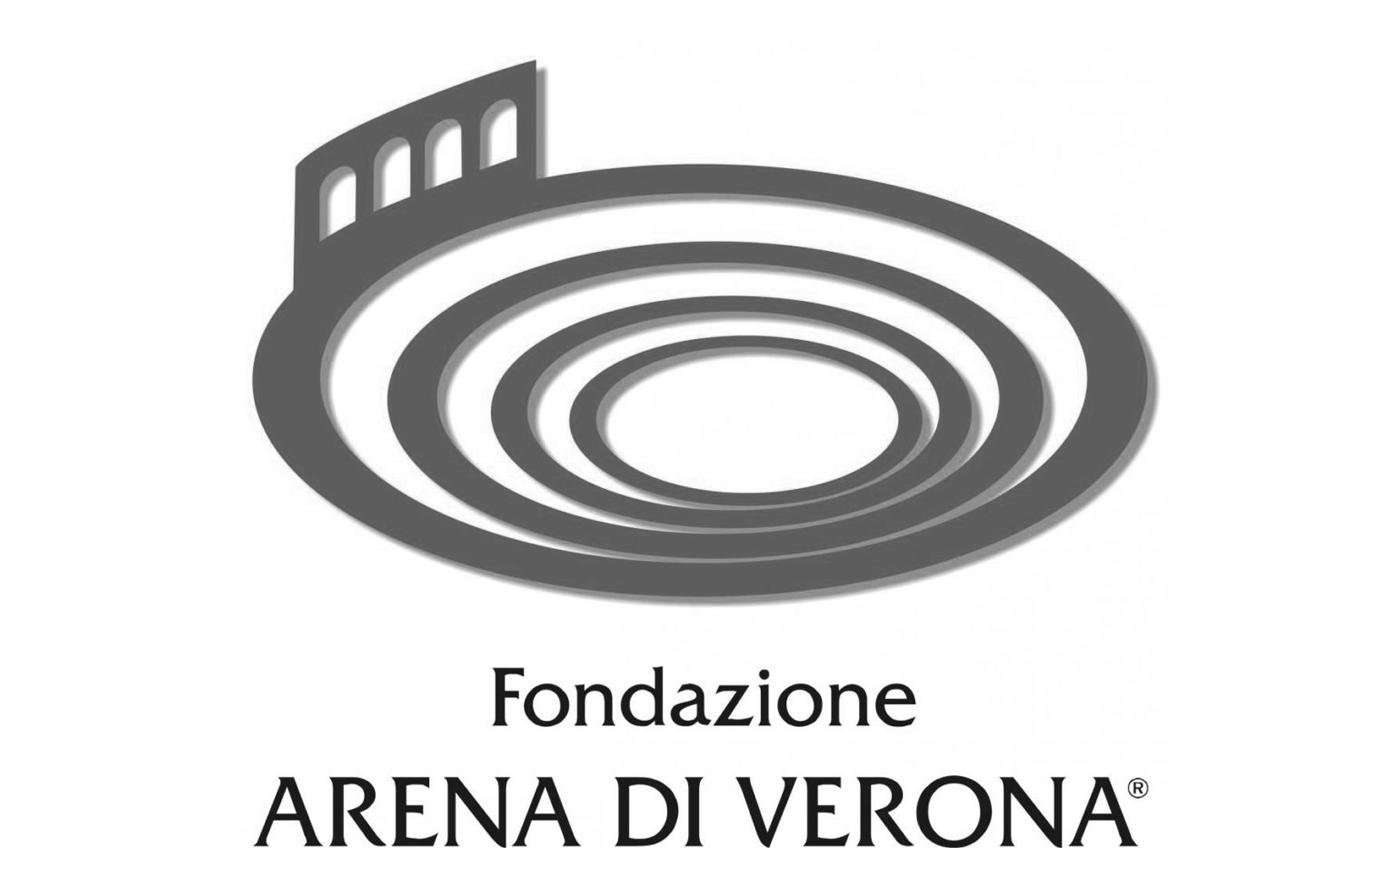 Arena di Verona FileMaker